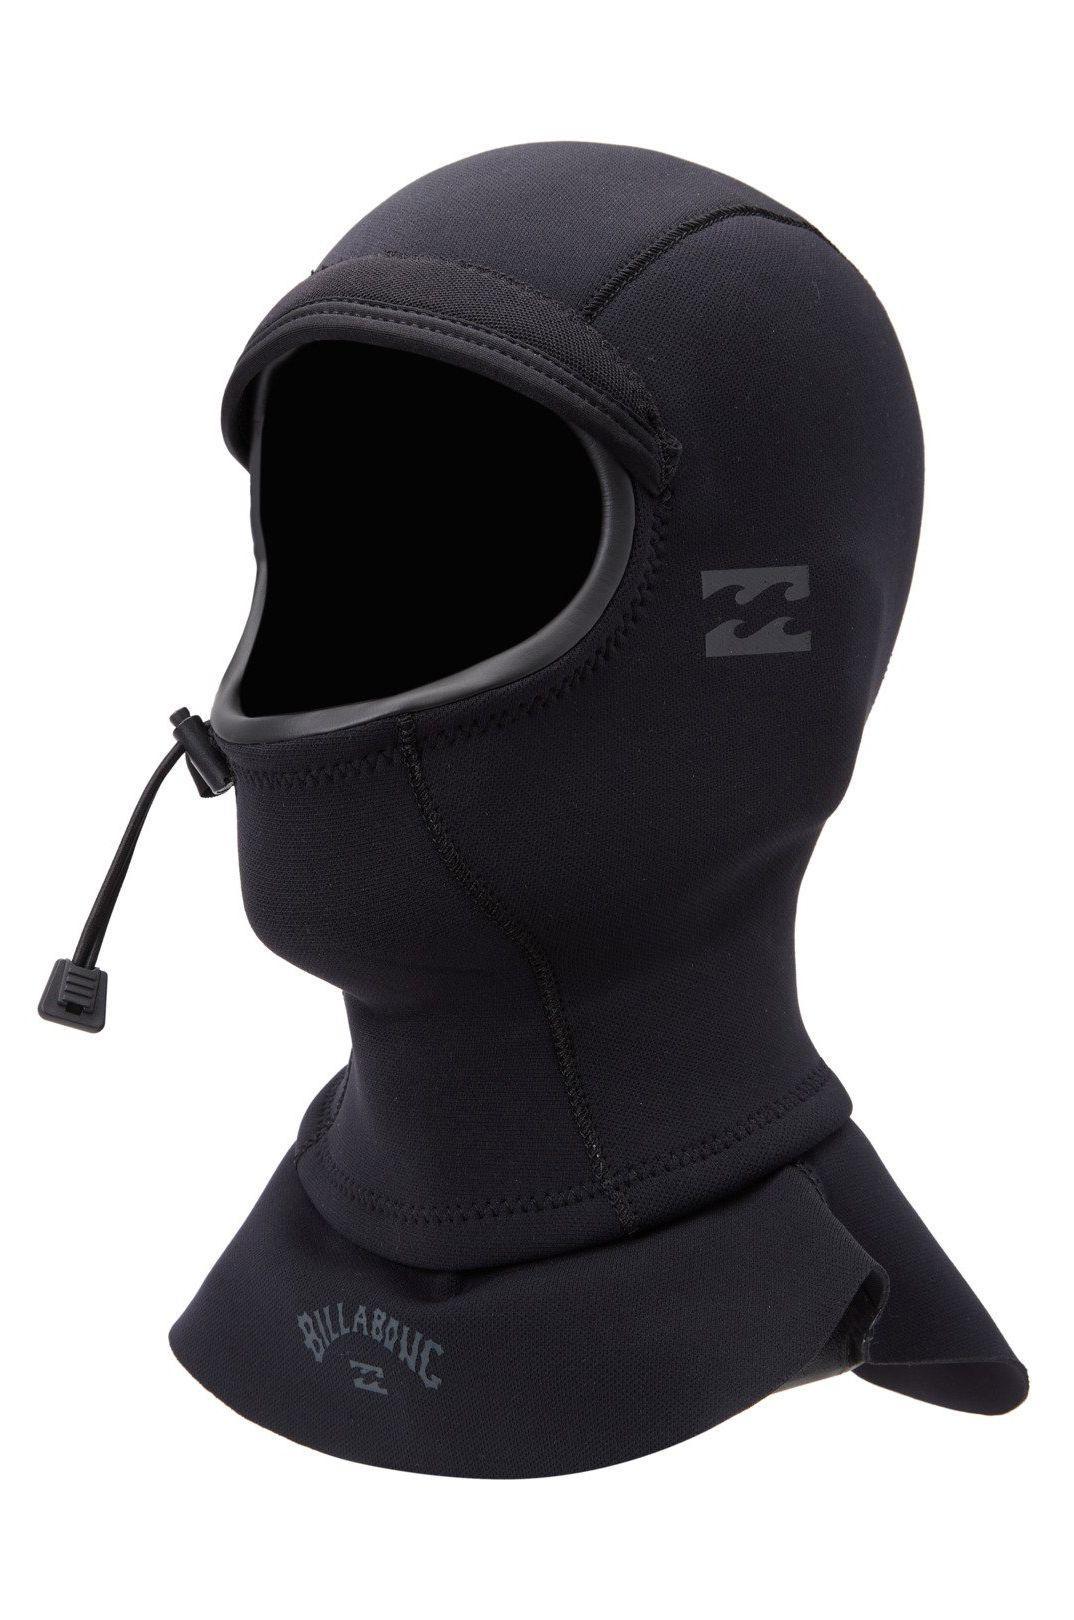 Billabong Neoprene Hoods 2 FURNACE GBS HD Black